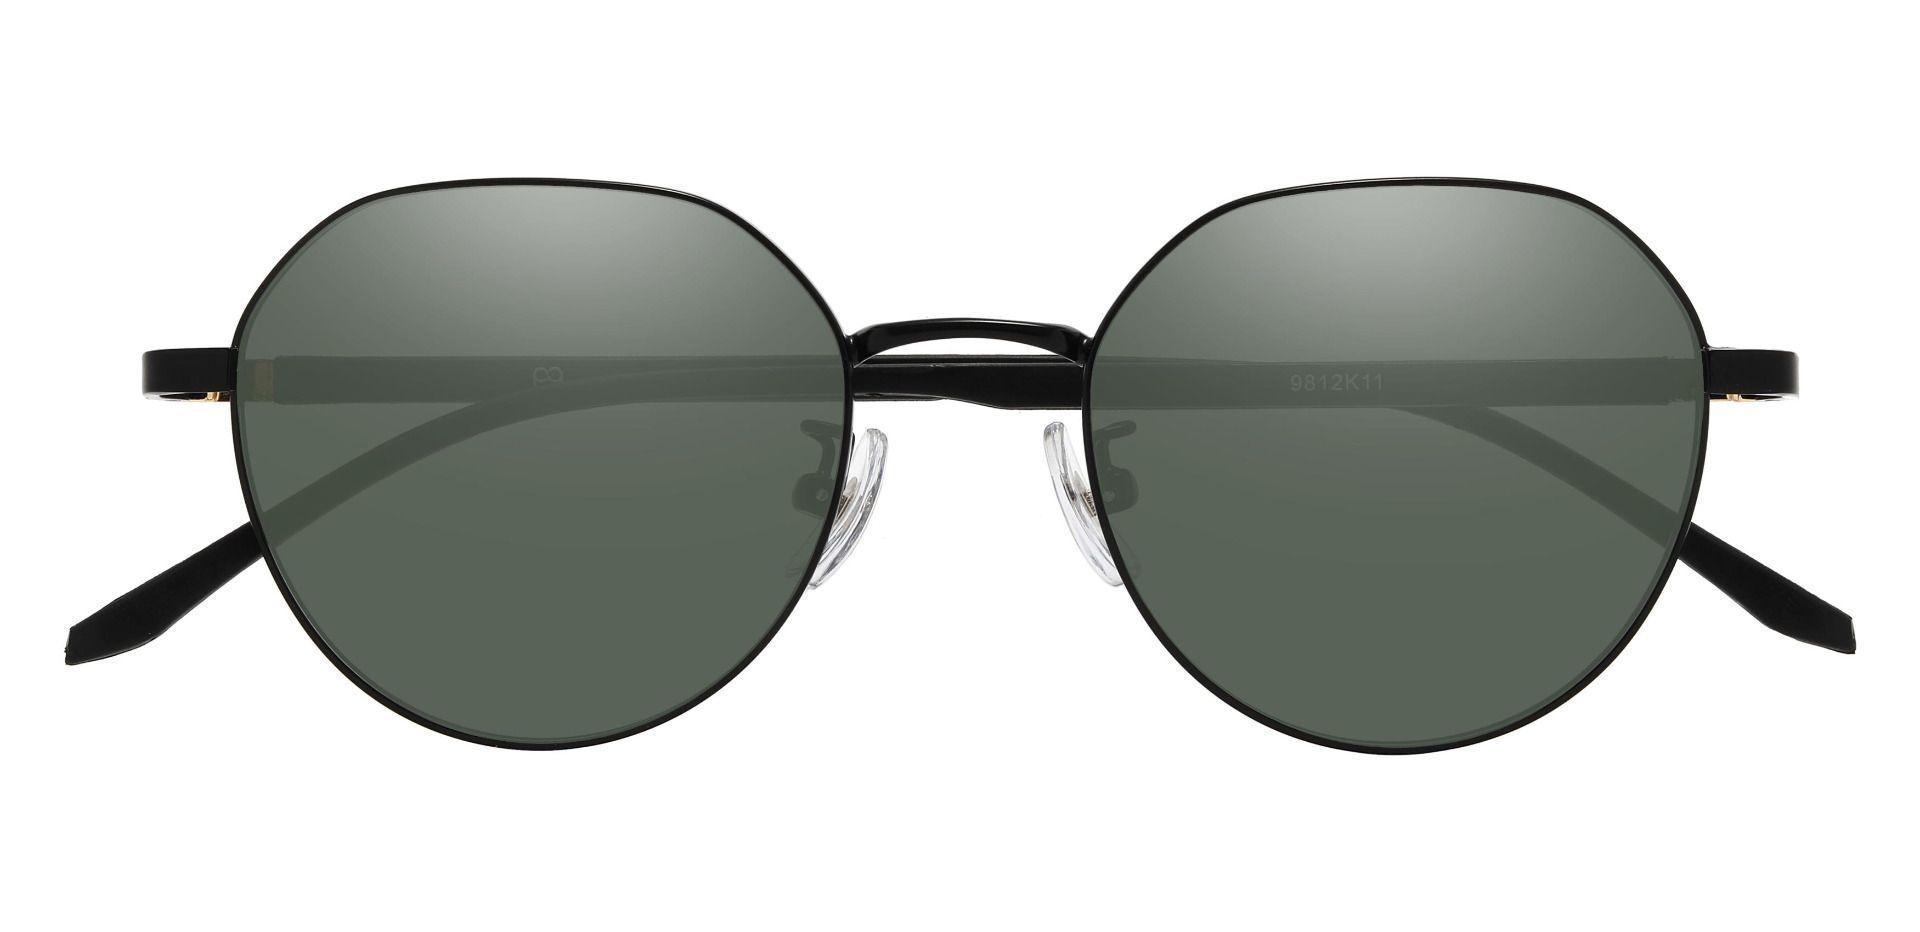 Beatrice Geometric Prescription Sunglasses - Black Frame With Green Lenses